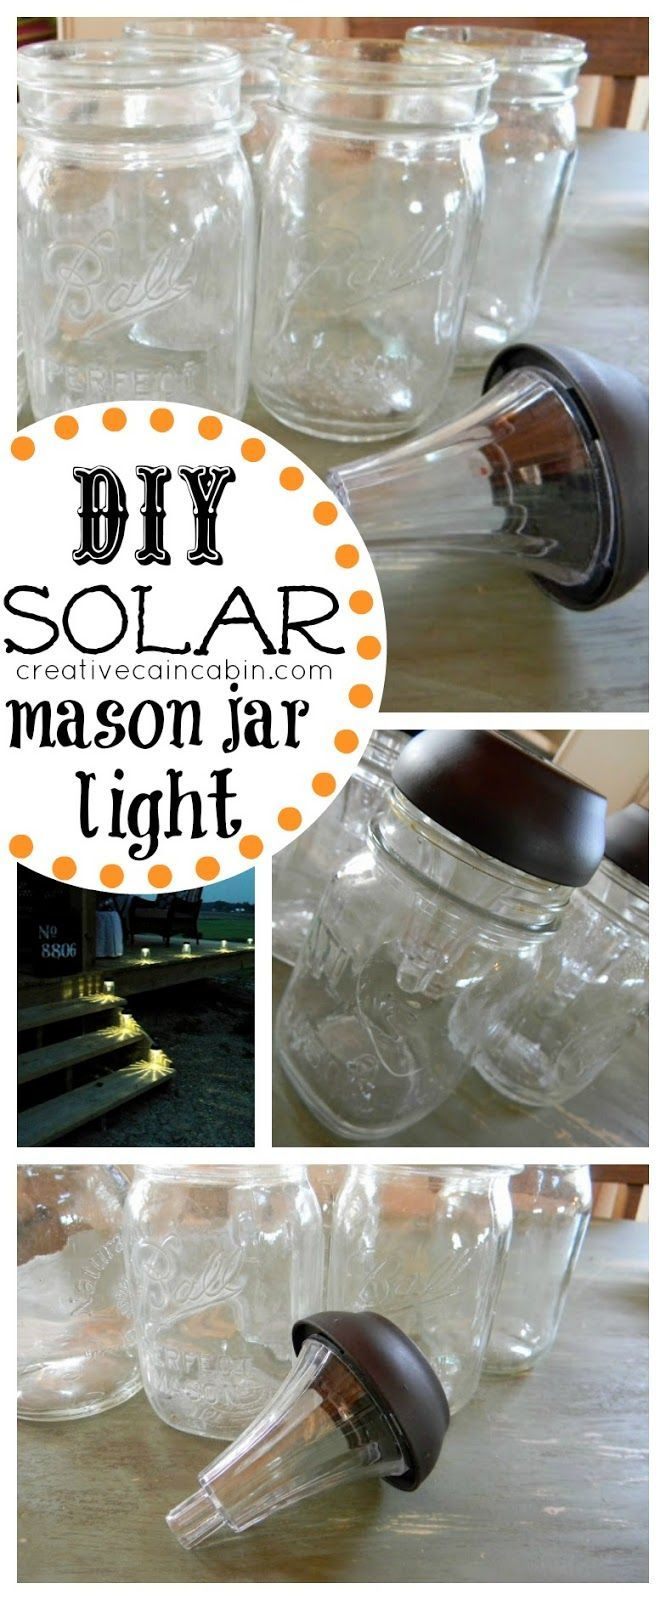 Small solar lights for crafts - Diy Solar Lamp